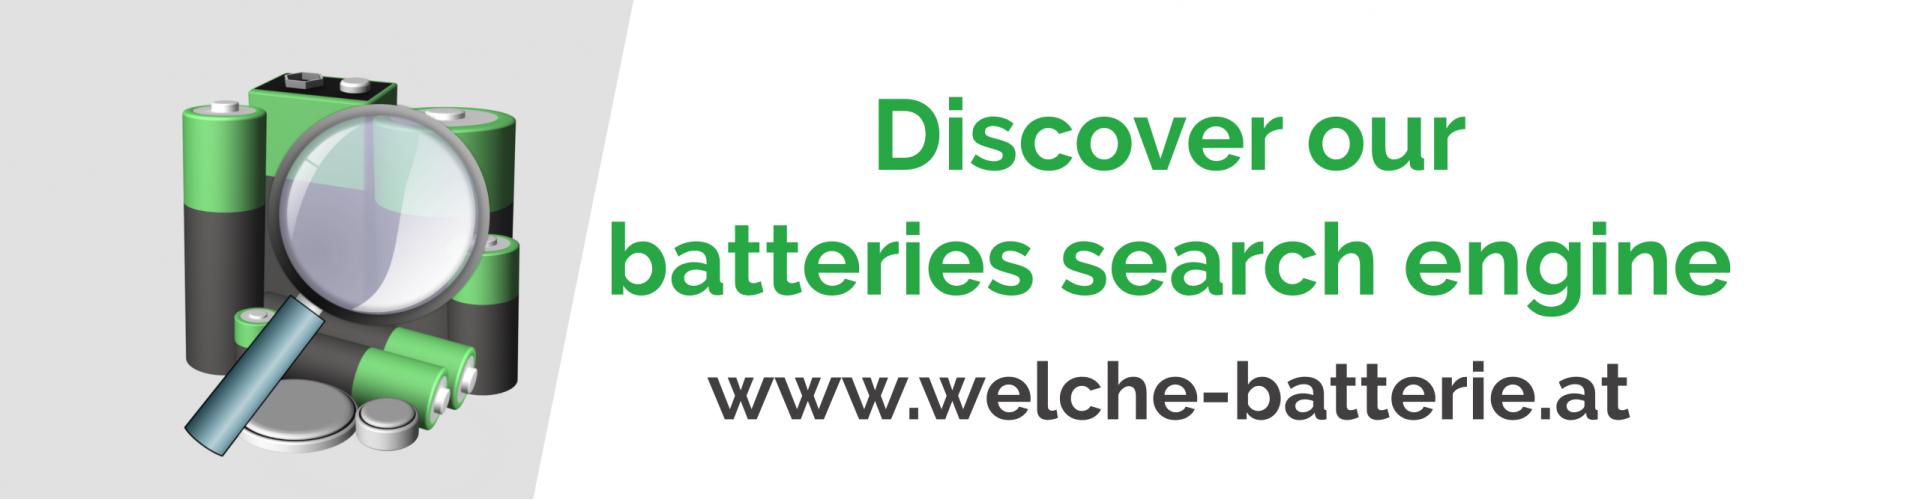 Welche-Batterie